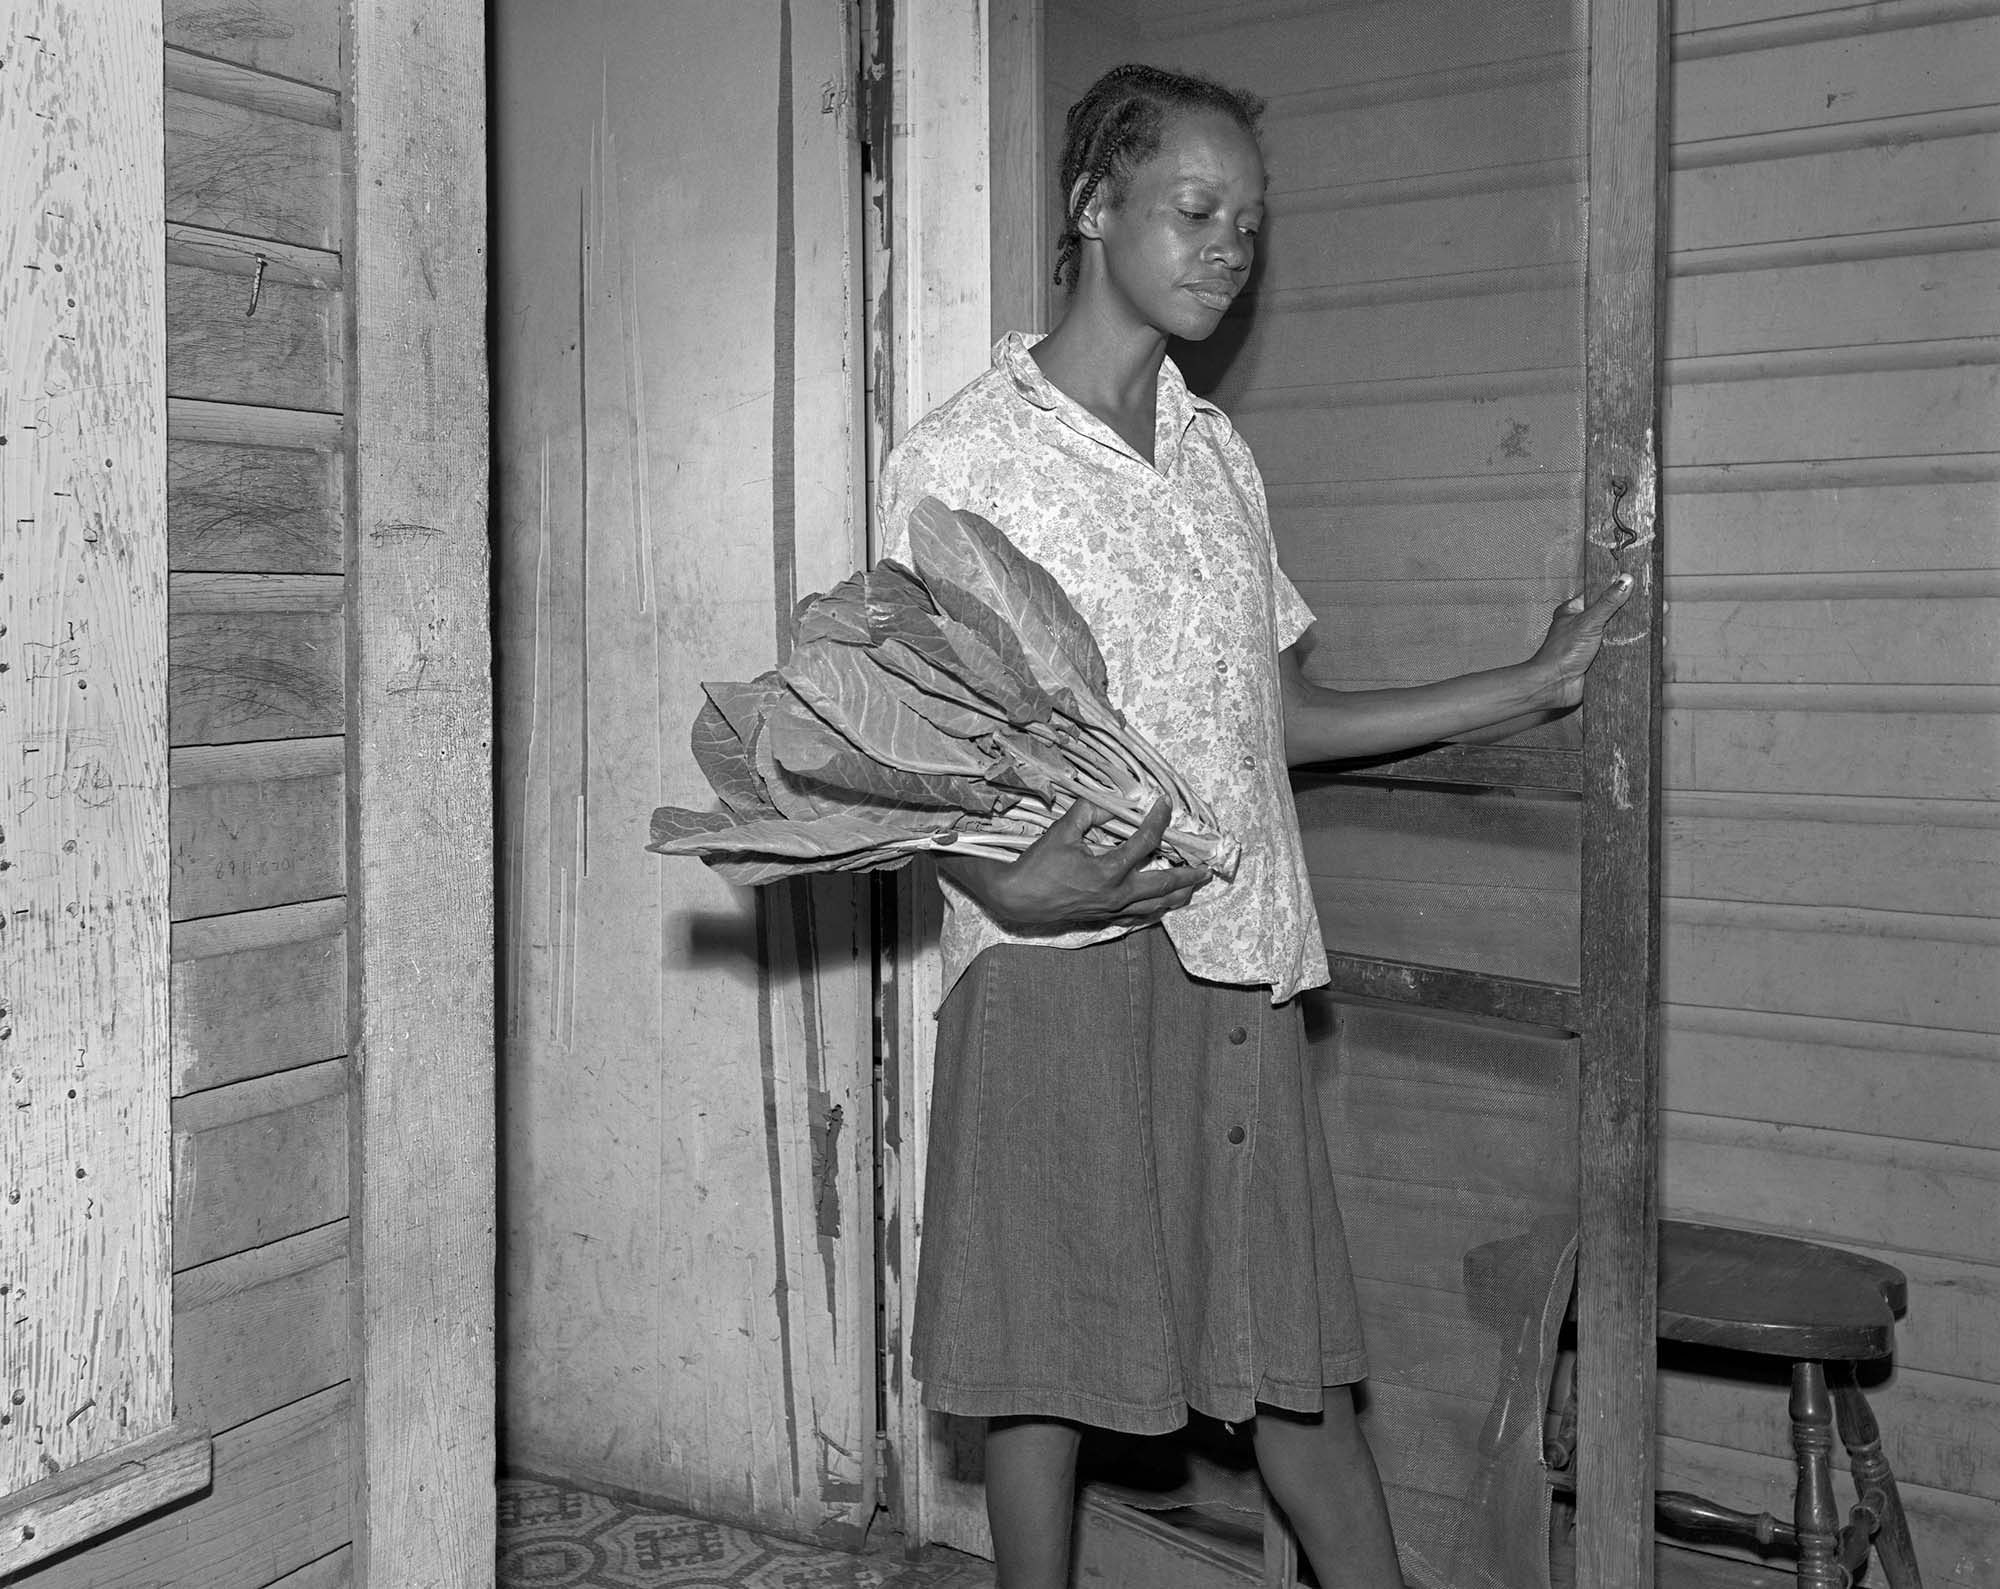 Woman with greens, Quitman, Ga.,1984.